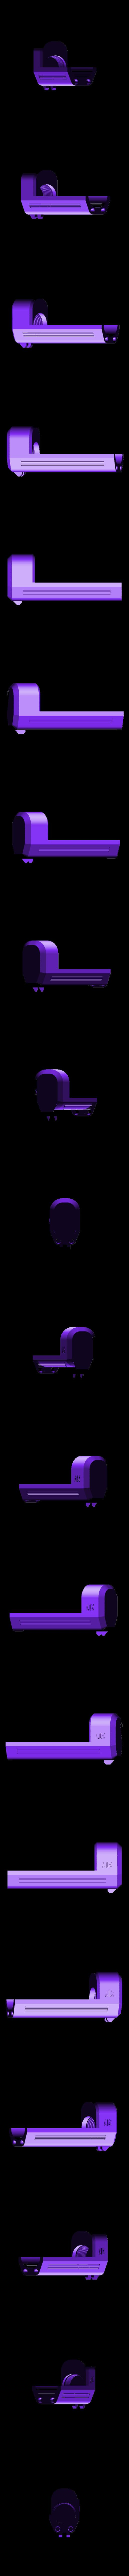 pistol_main_body.stl Download free STL file PISTOL VR magnetic gunstock Oculus Rift-S Quest • 3D printer template, danielschweinert